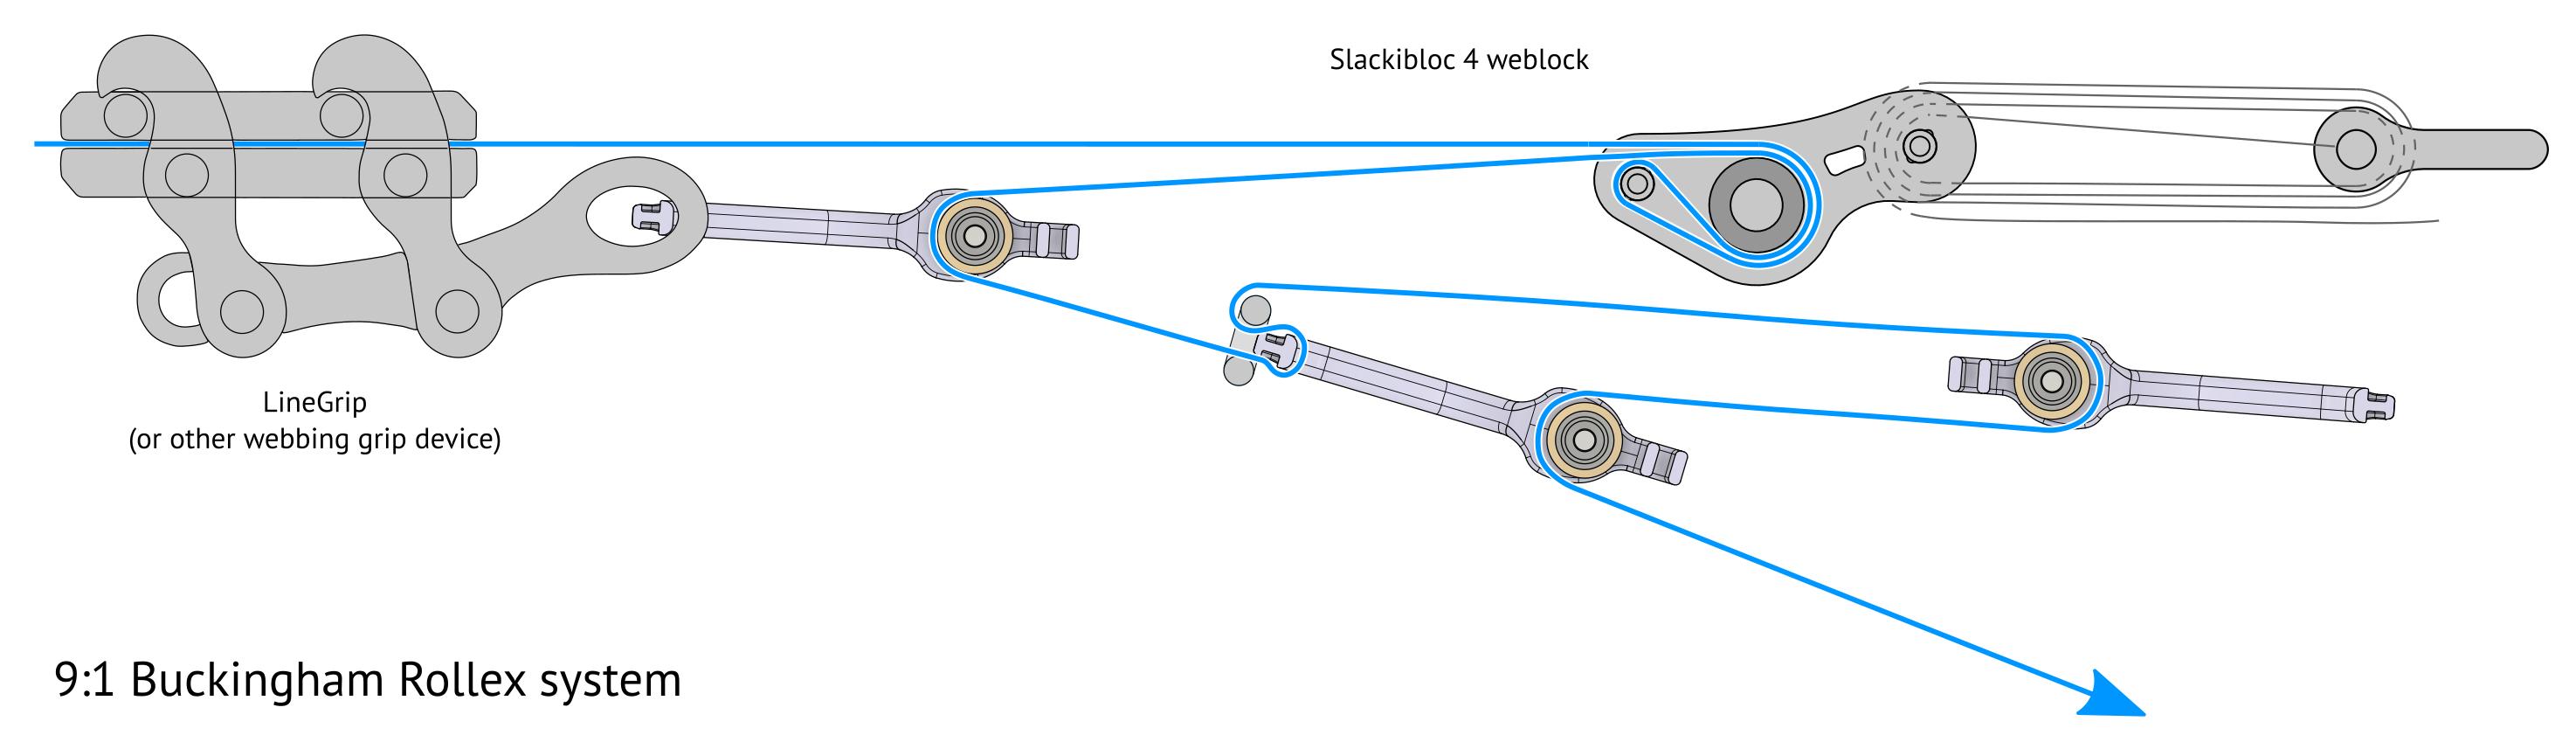 ROLLEX BUCKINGHAM SYSTEM WITH SLACKIBLOC